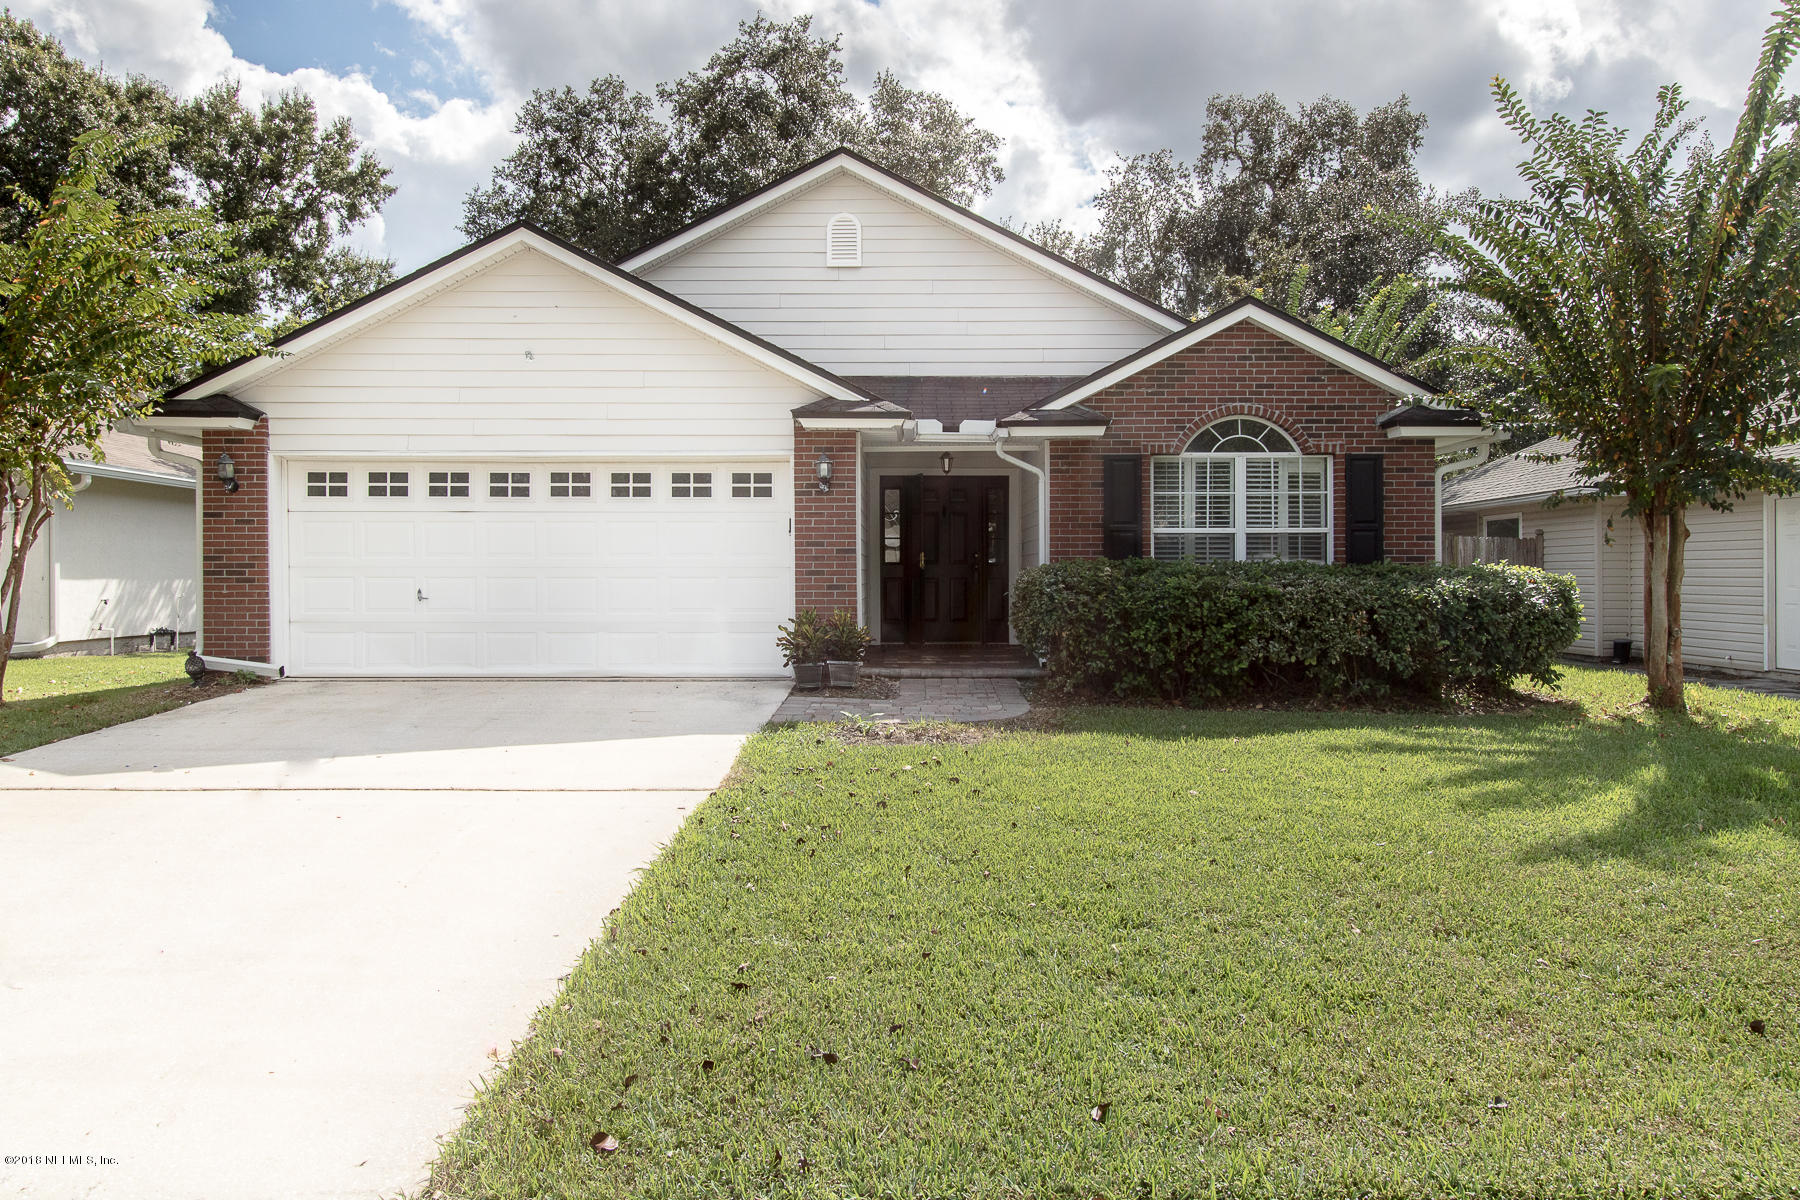 2335 SIDE WHEEL, ORANGE PARK, FLORIDA 32003, 4 Bedrooms Bedrooms, ,2 BathroomsBathrooms,Residential - single family,For sale,SIDE WHEEL,963348